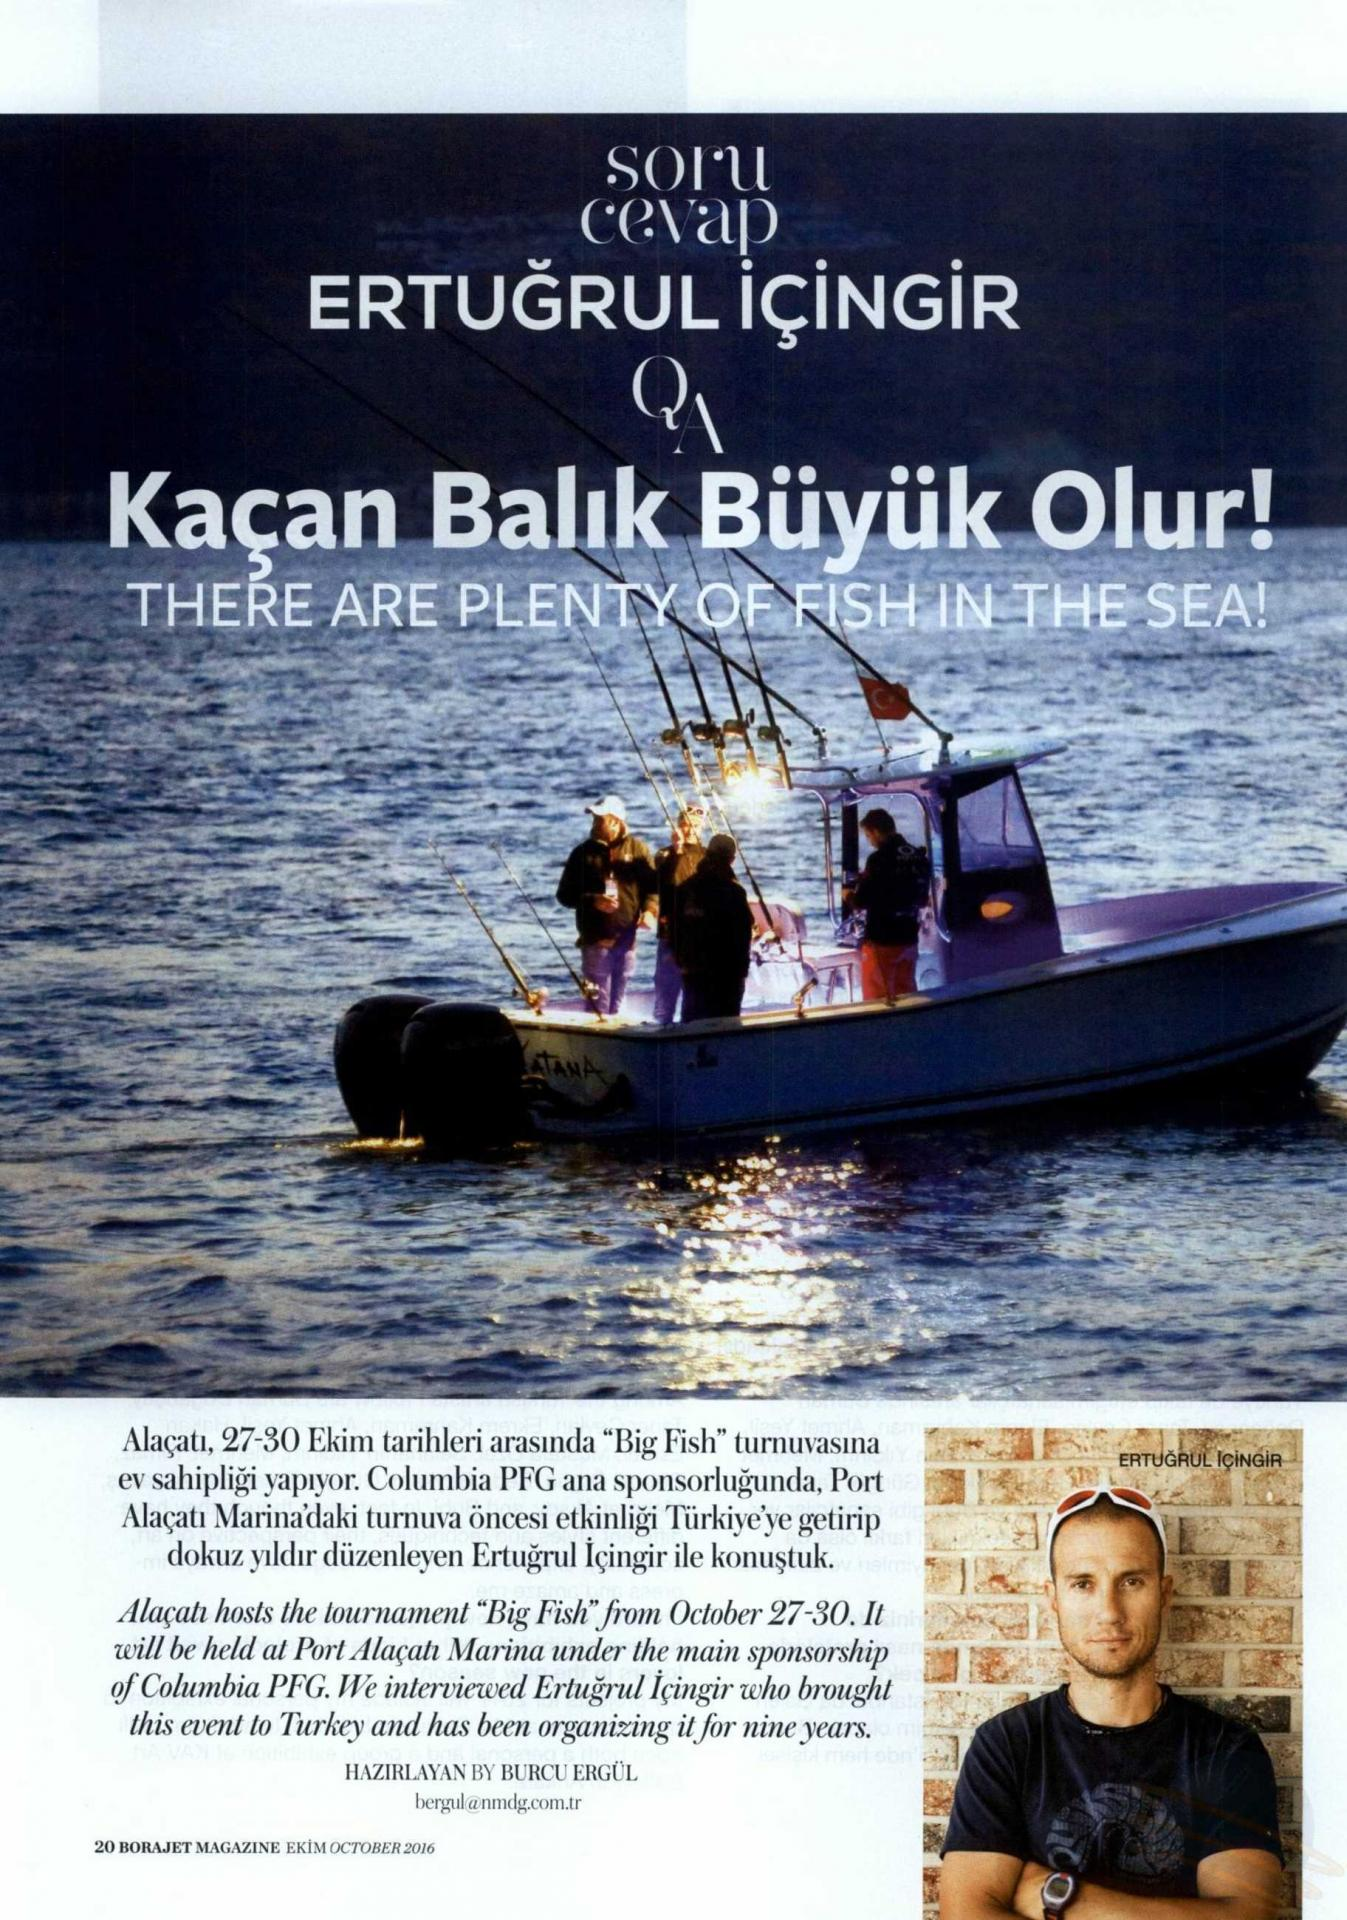 8014_8267_9331-Borajet_Dergisi